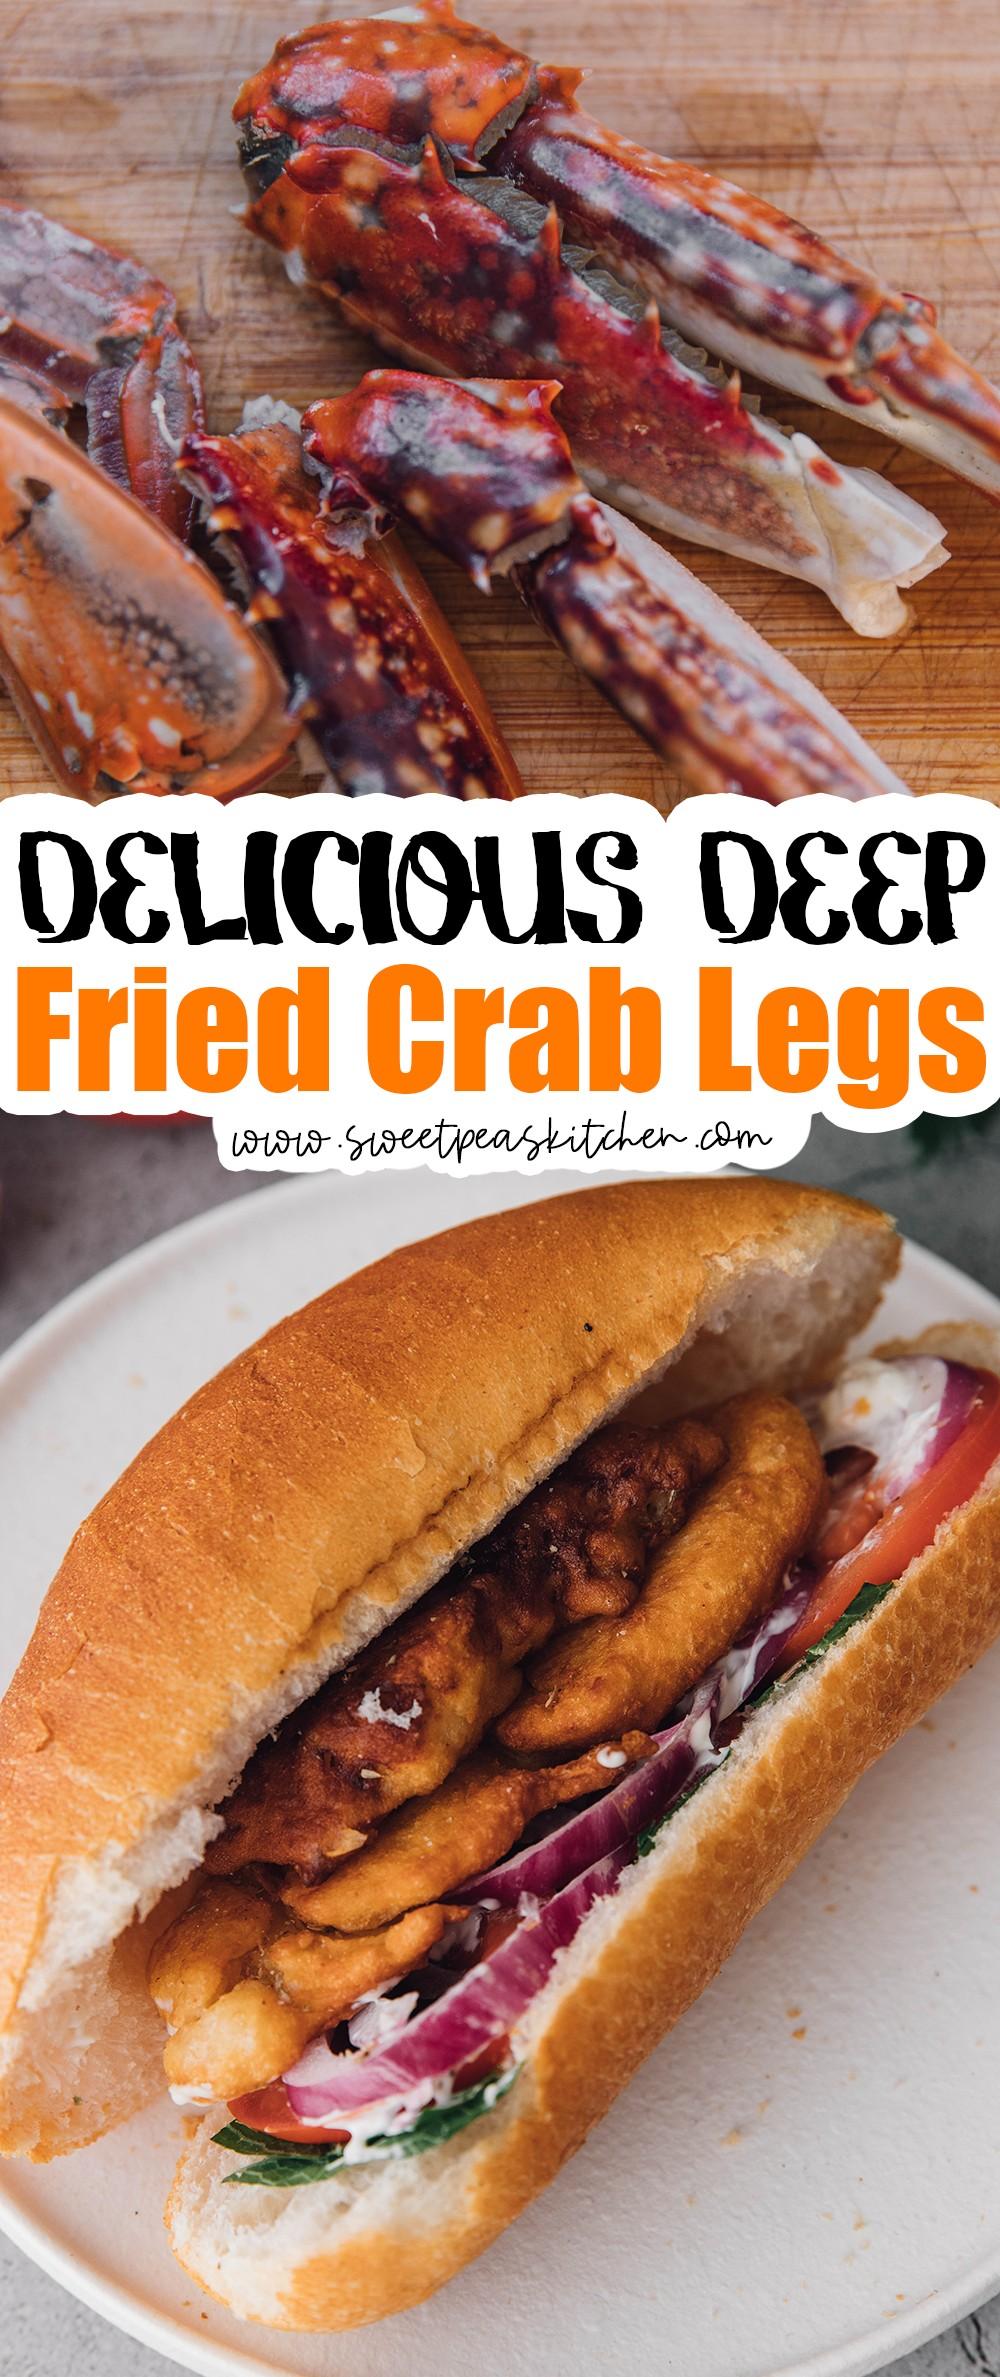 Deep Fried Crab Legs